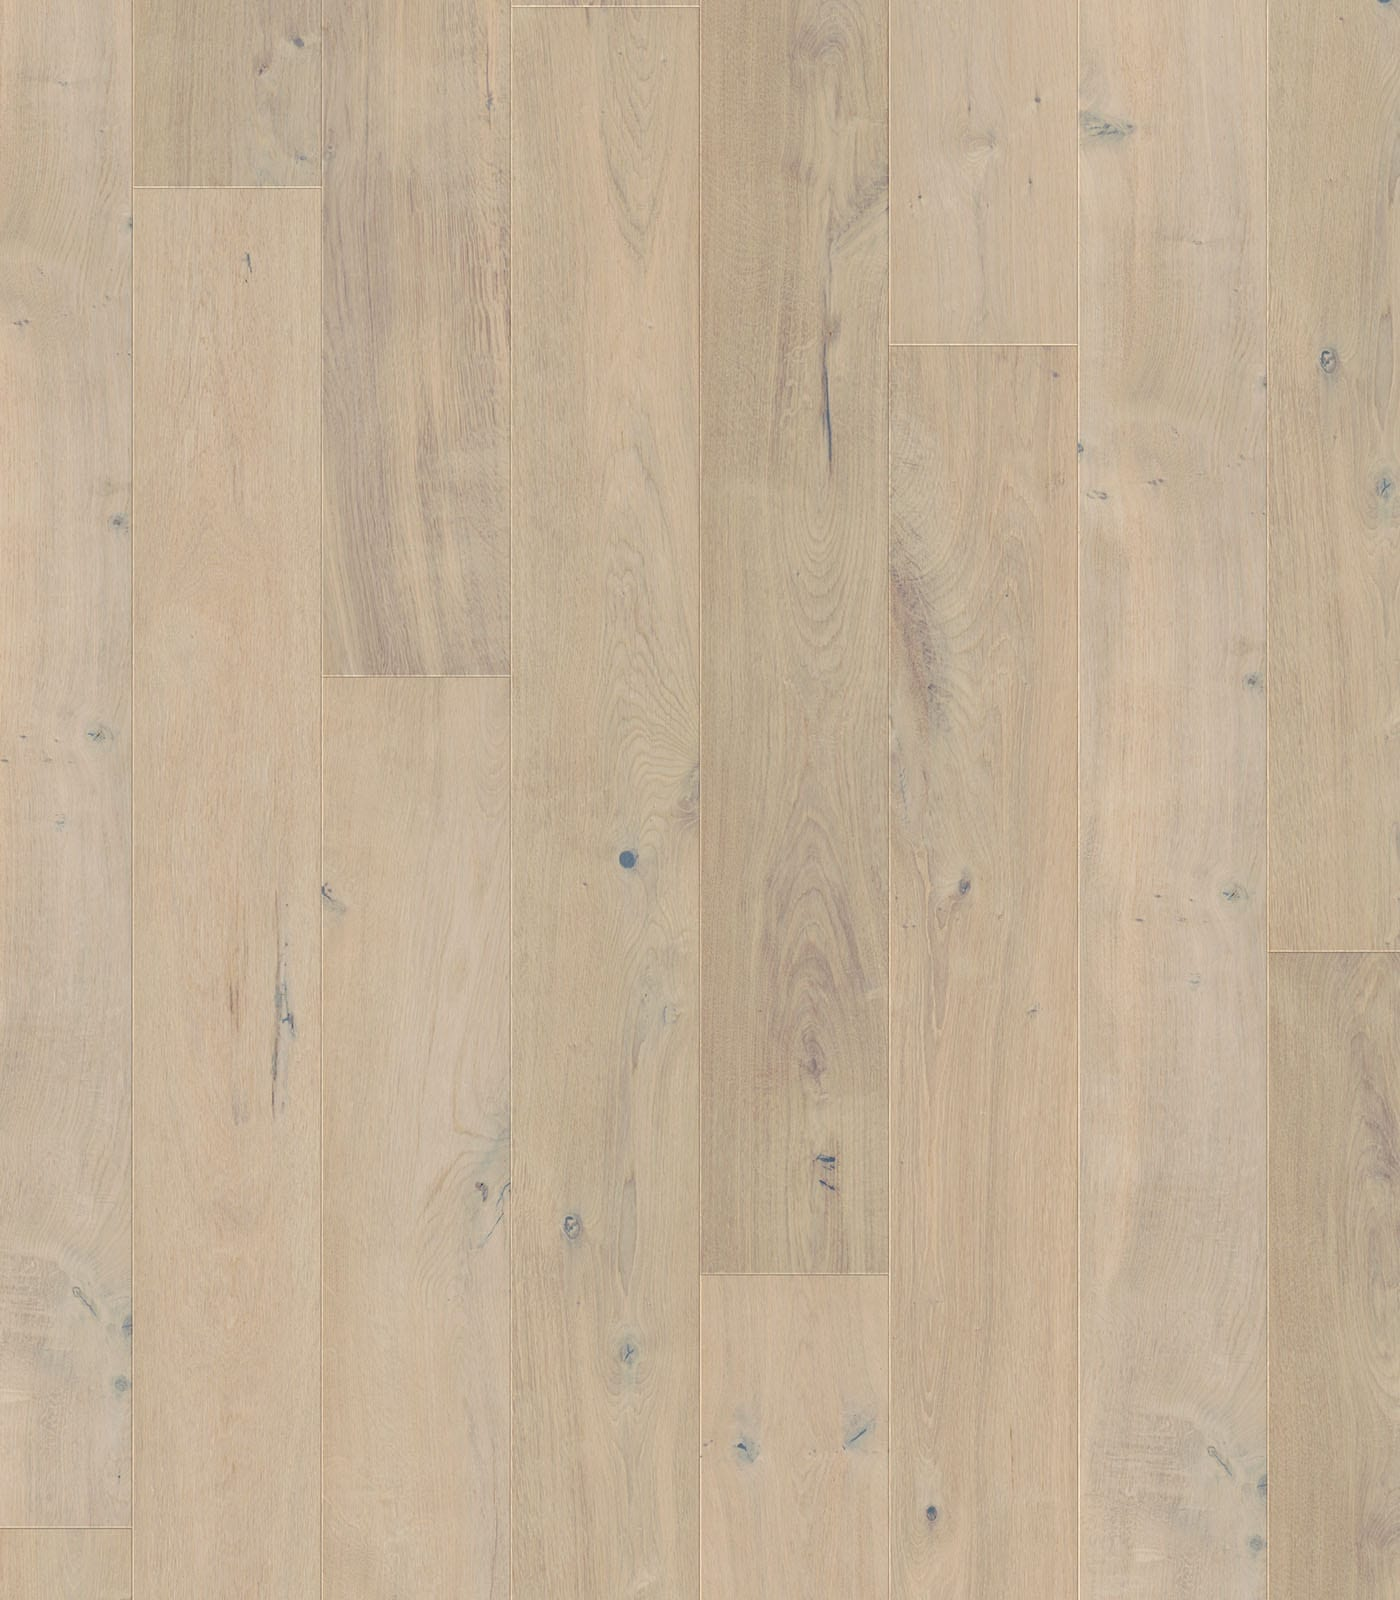 Oahu-engineered European Oak flooring